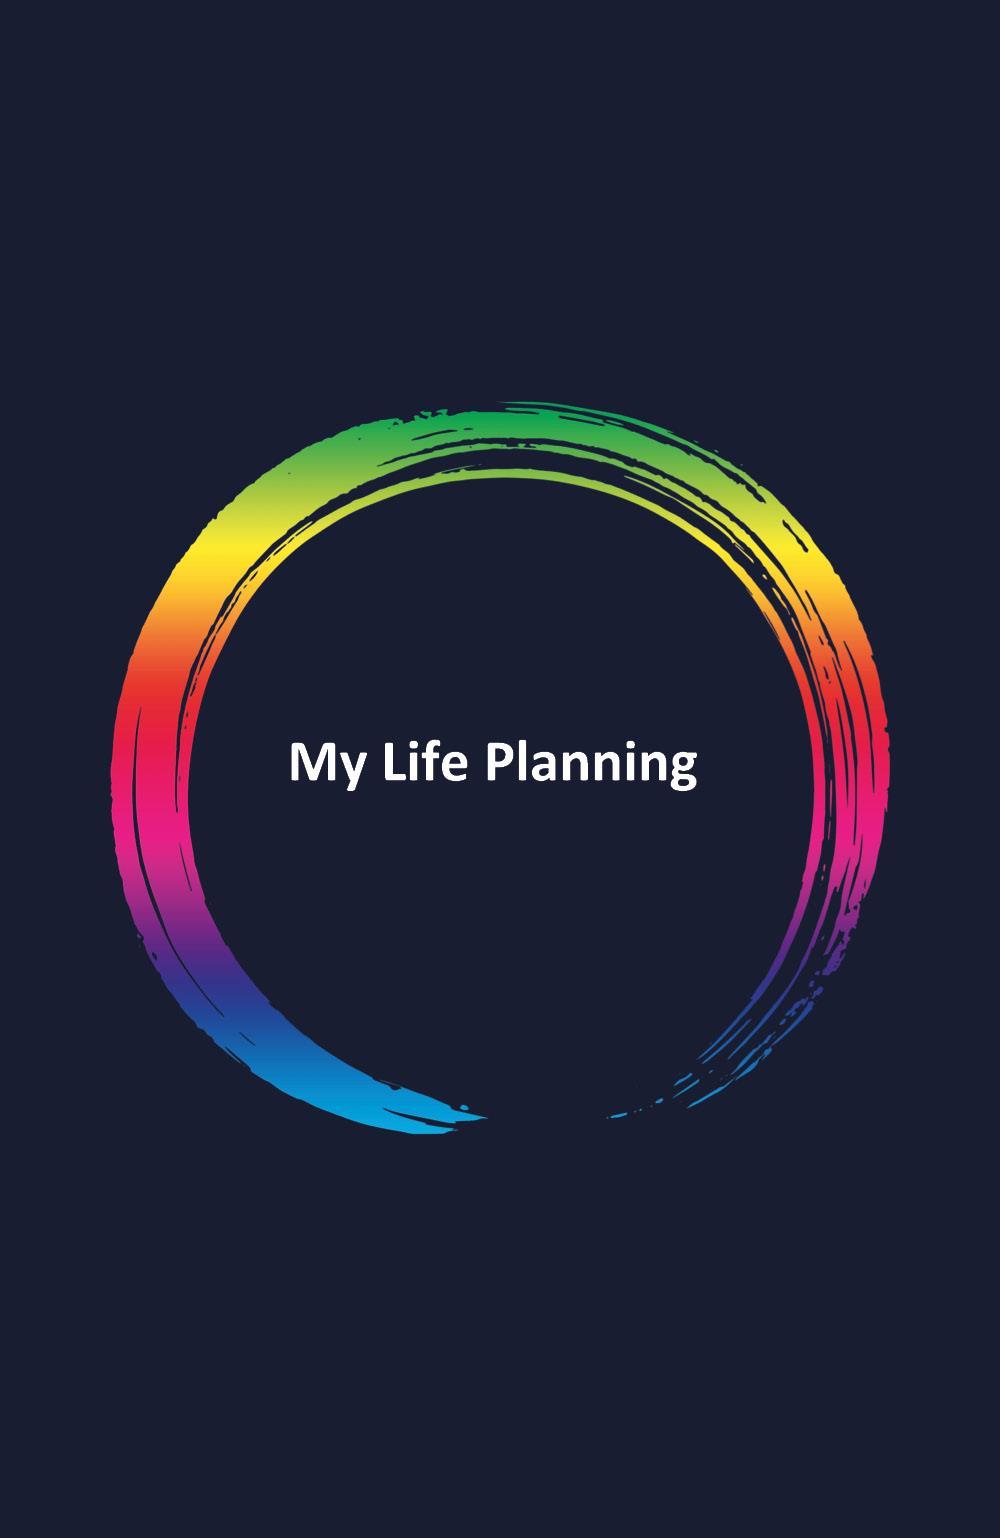 My life Planning